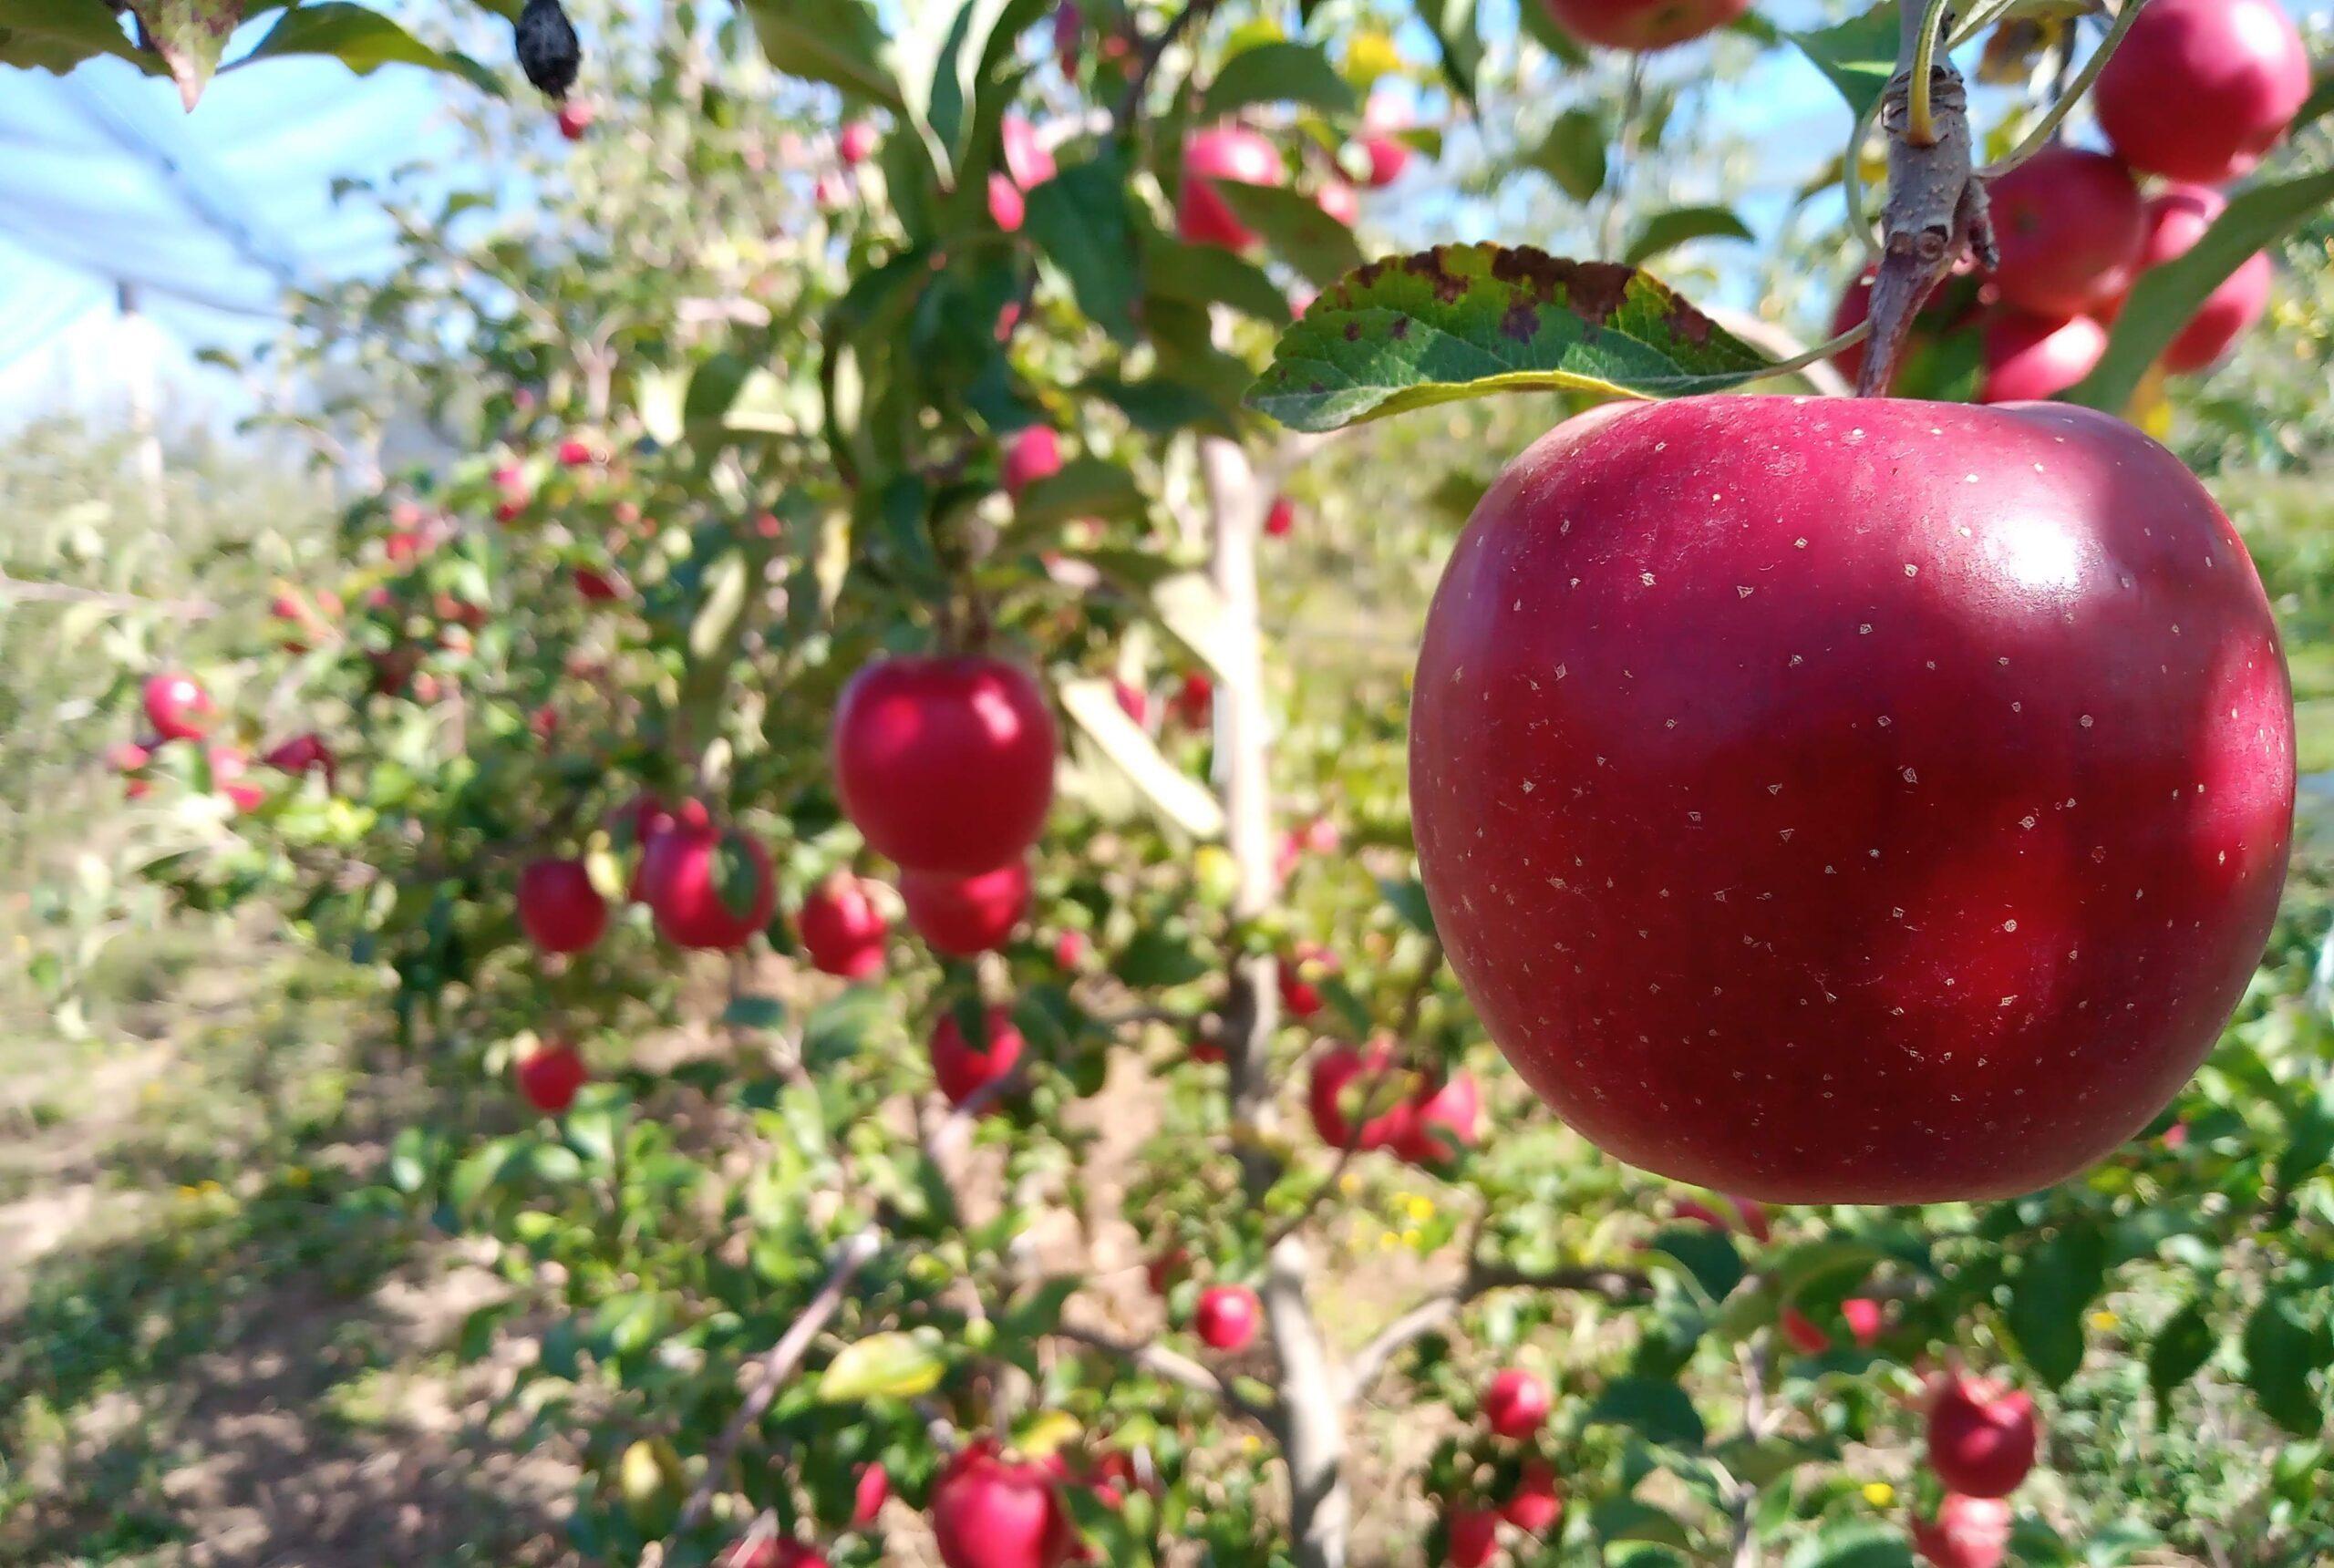 Pomes roges Biolord | Cedida